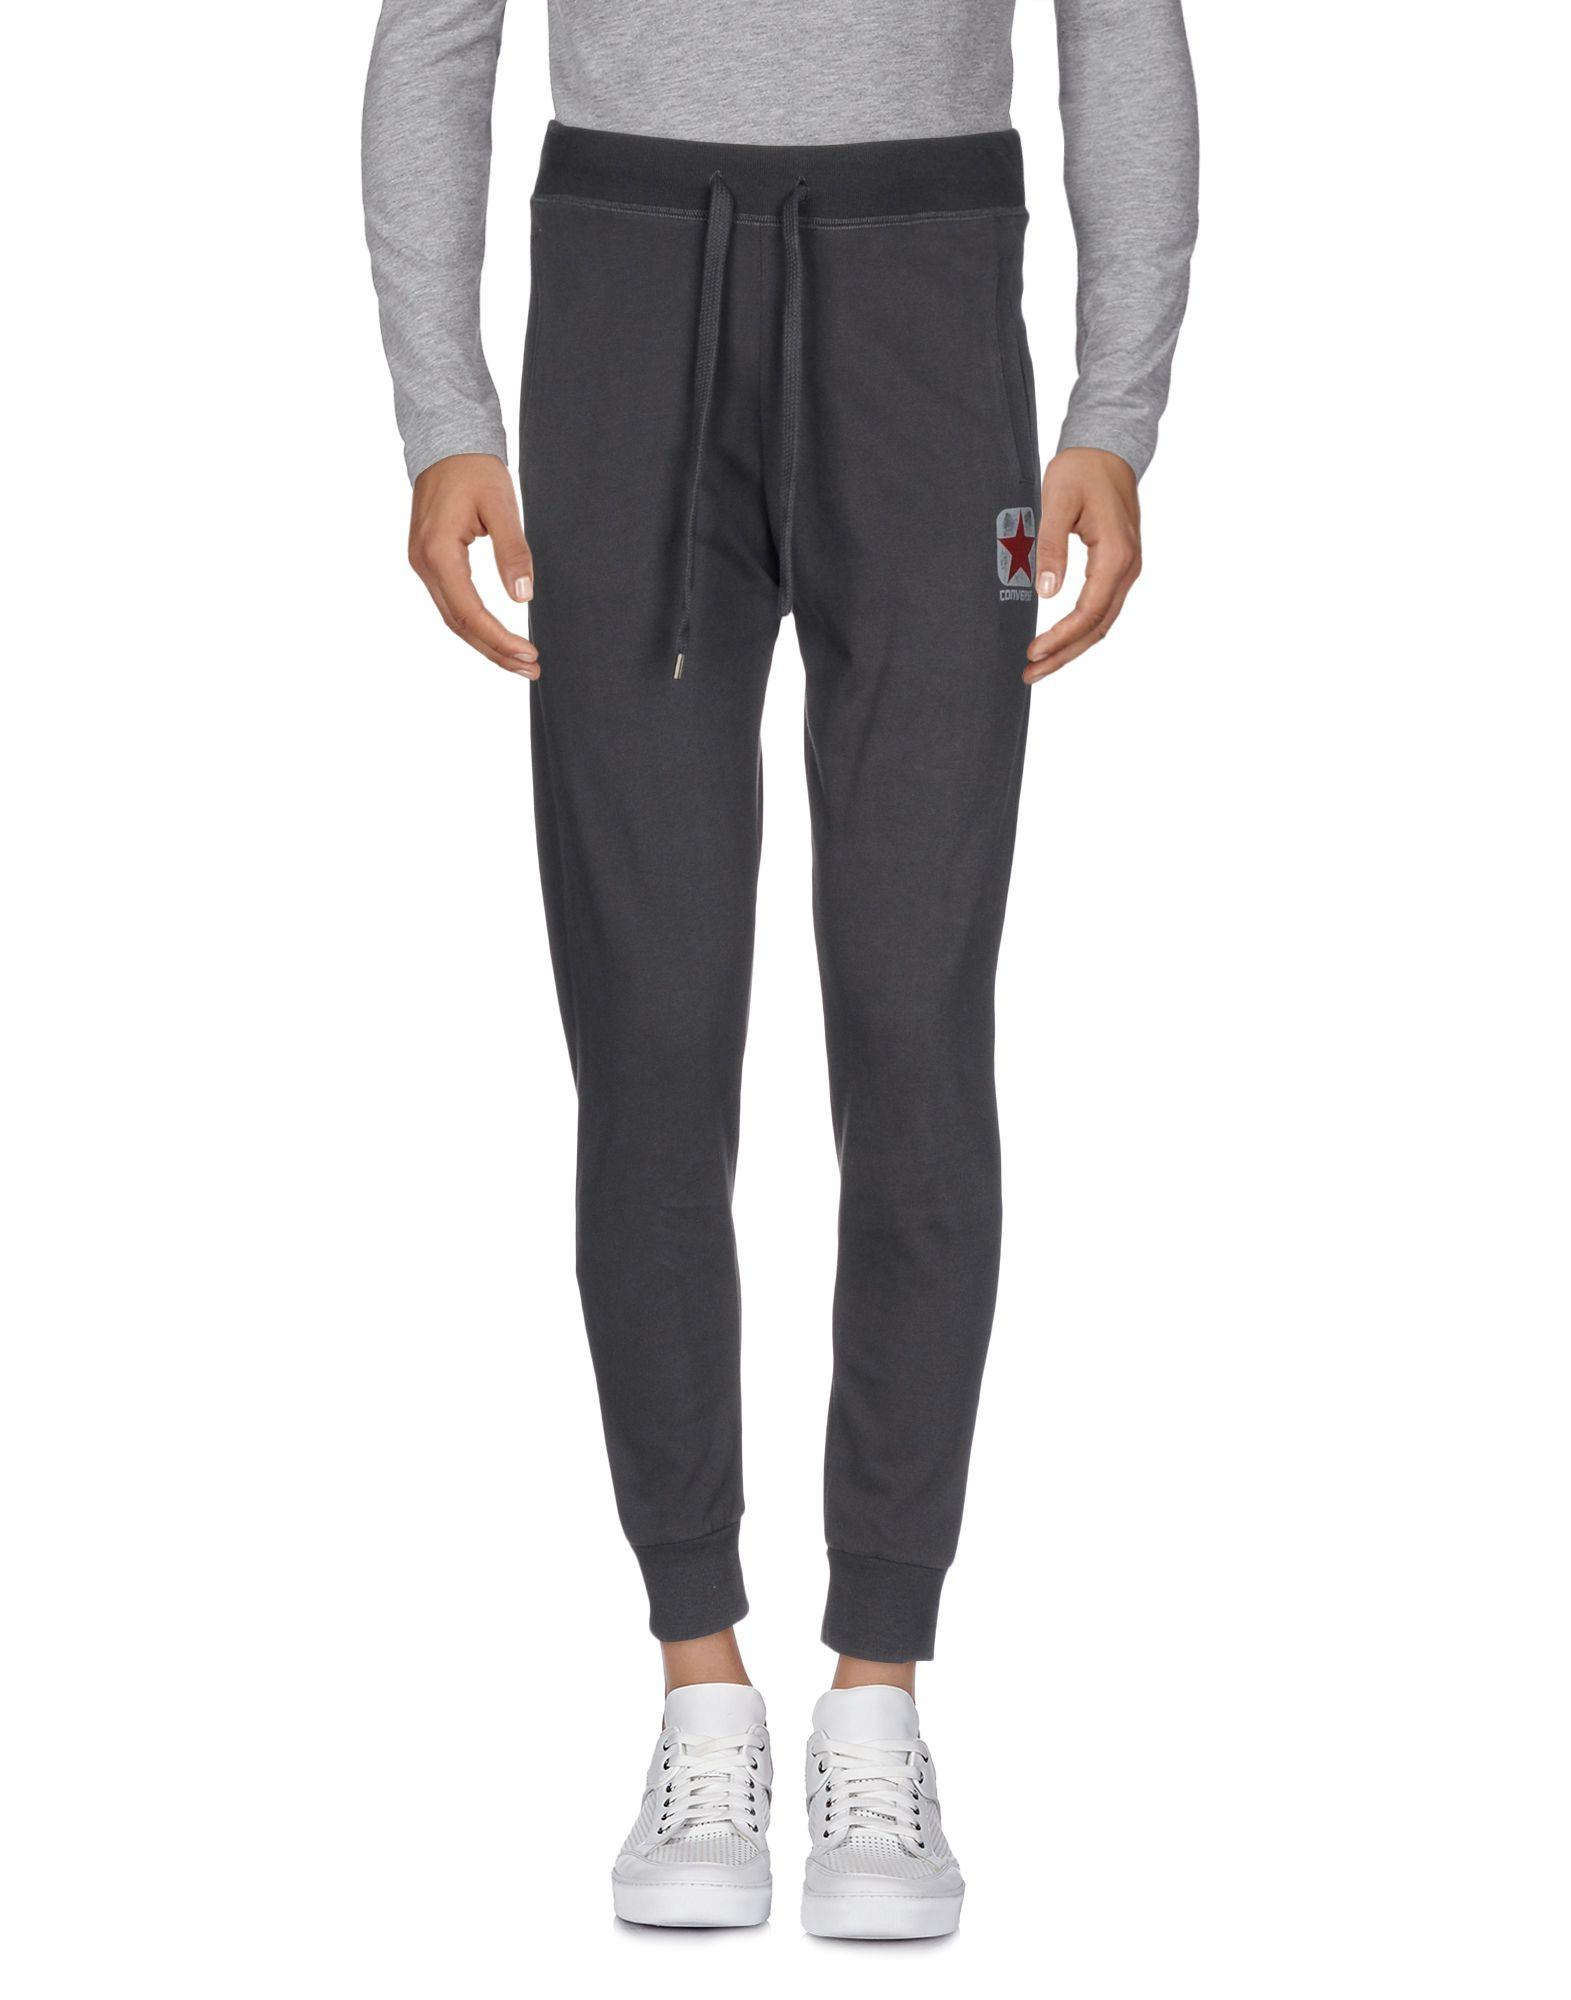 Converse Casual Pants In Steel Grey